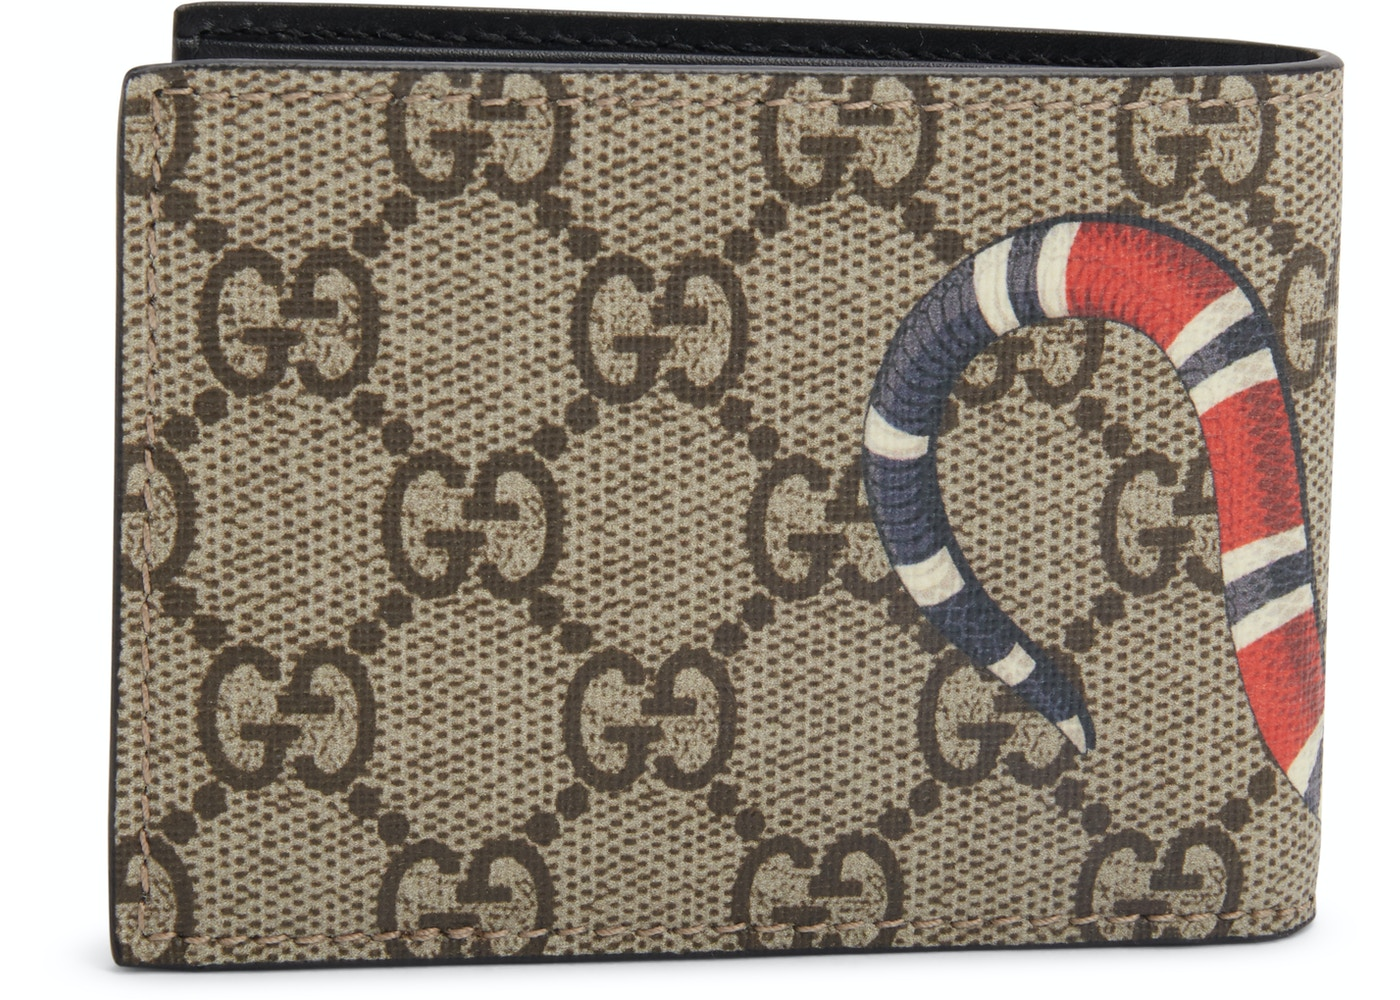 c76e2eab763de2 Buy & Sell Gucci Luxury Handbags